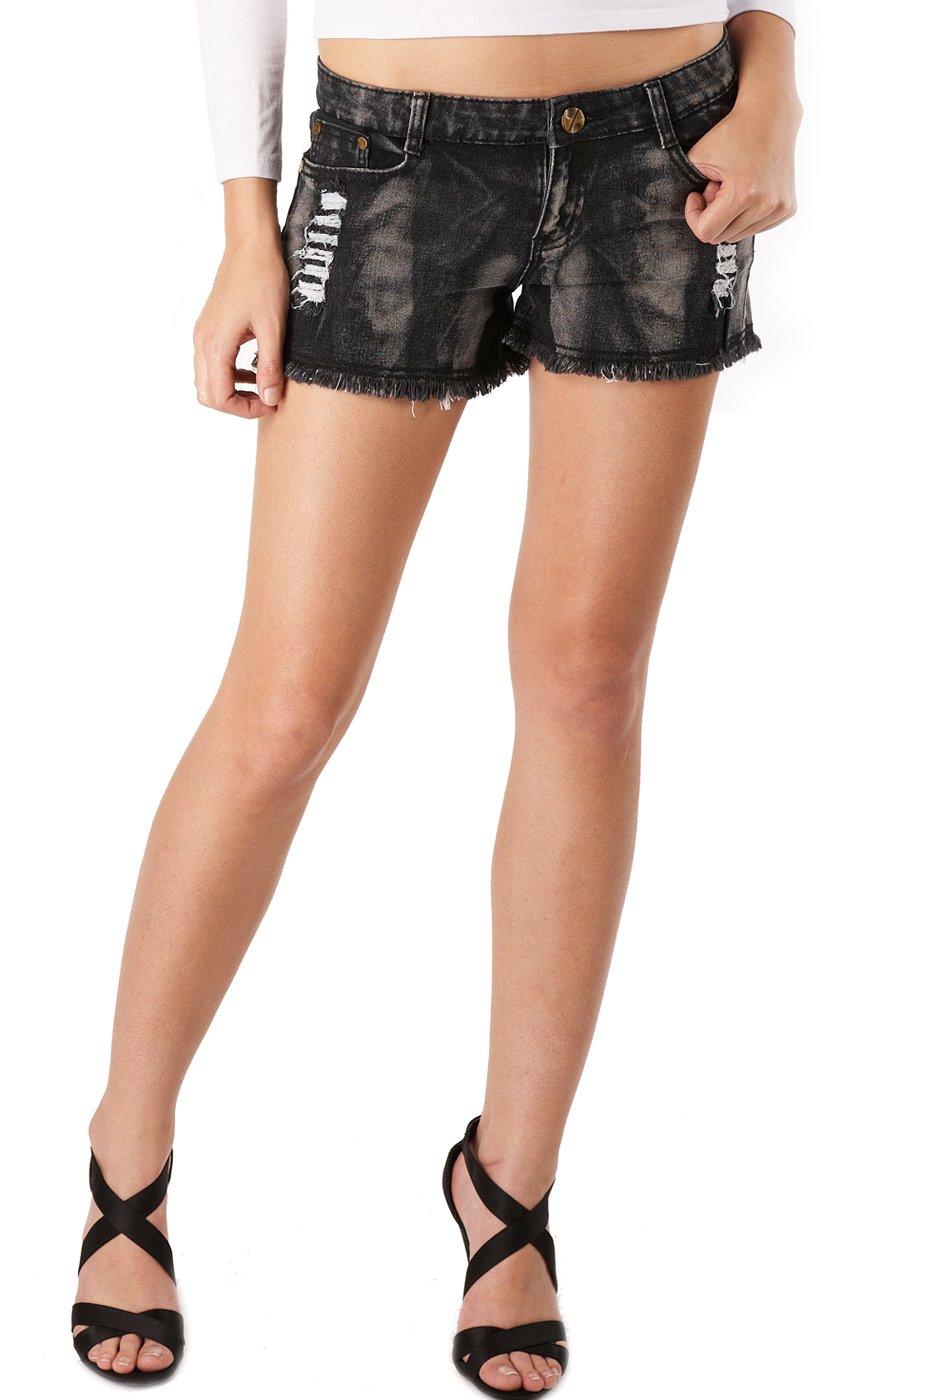 Jessie G. Women's Low Rise Destructed Denim Frayed Short Shorts - 4